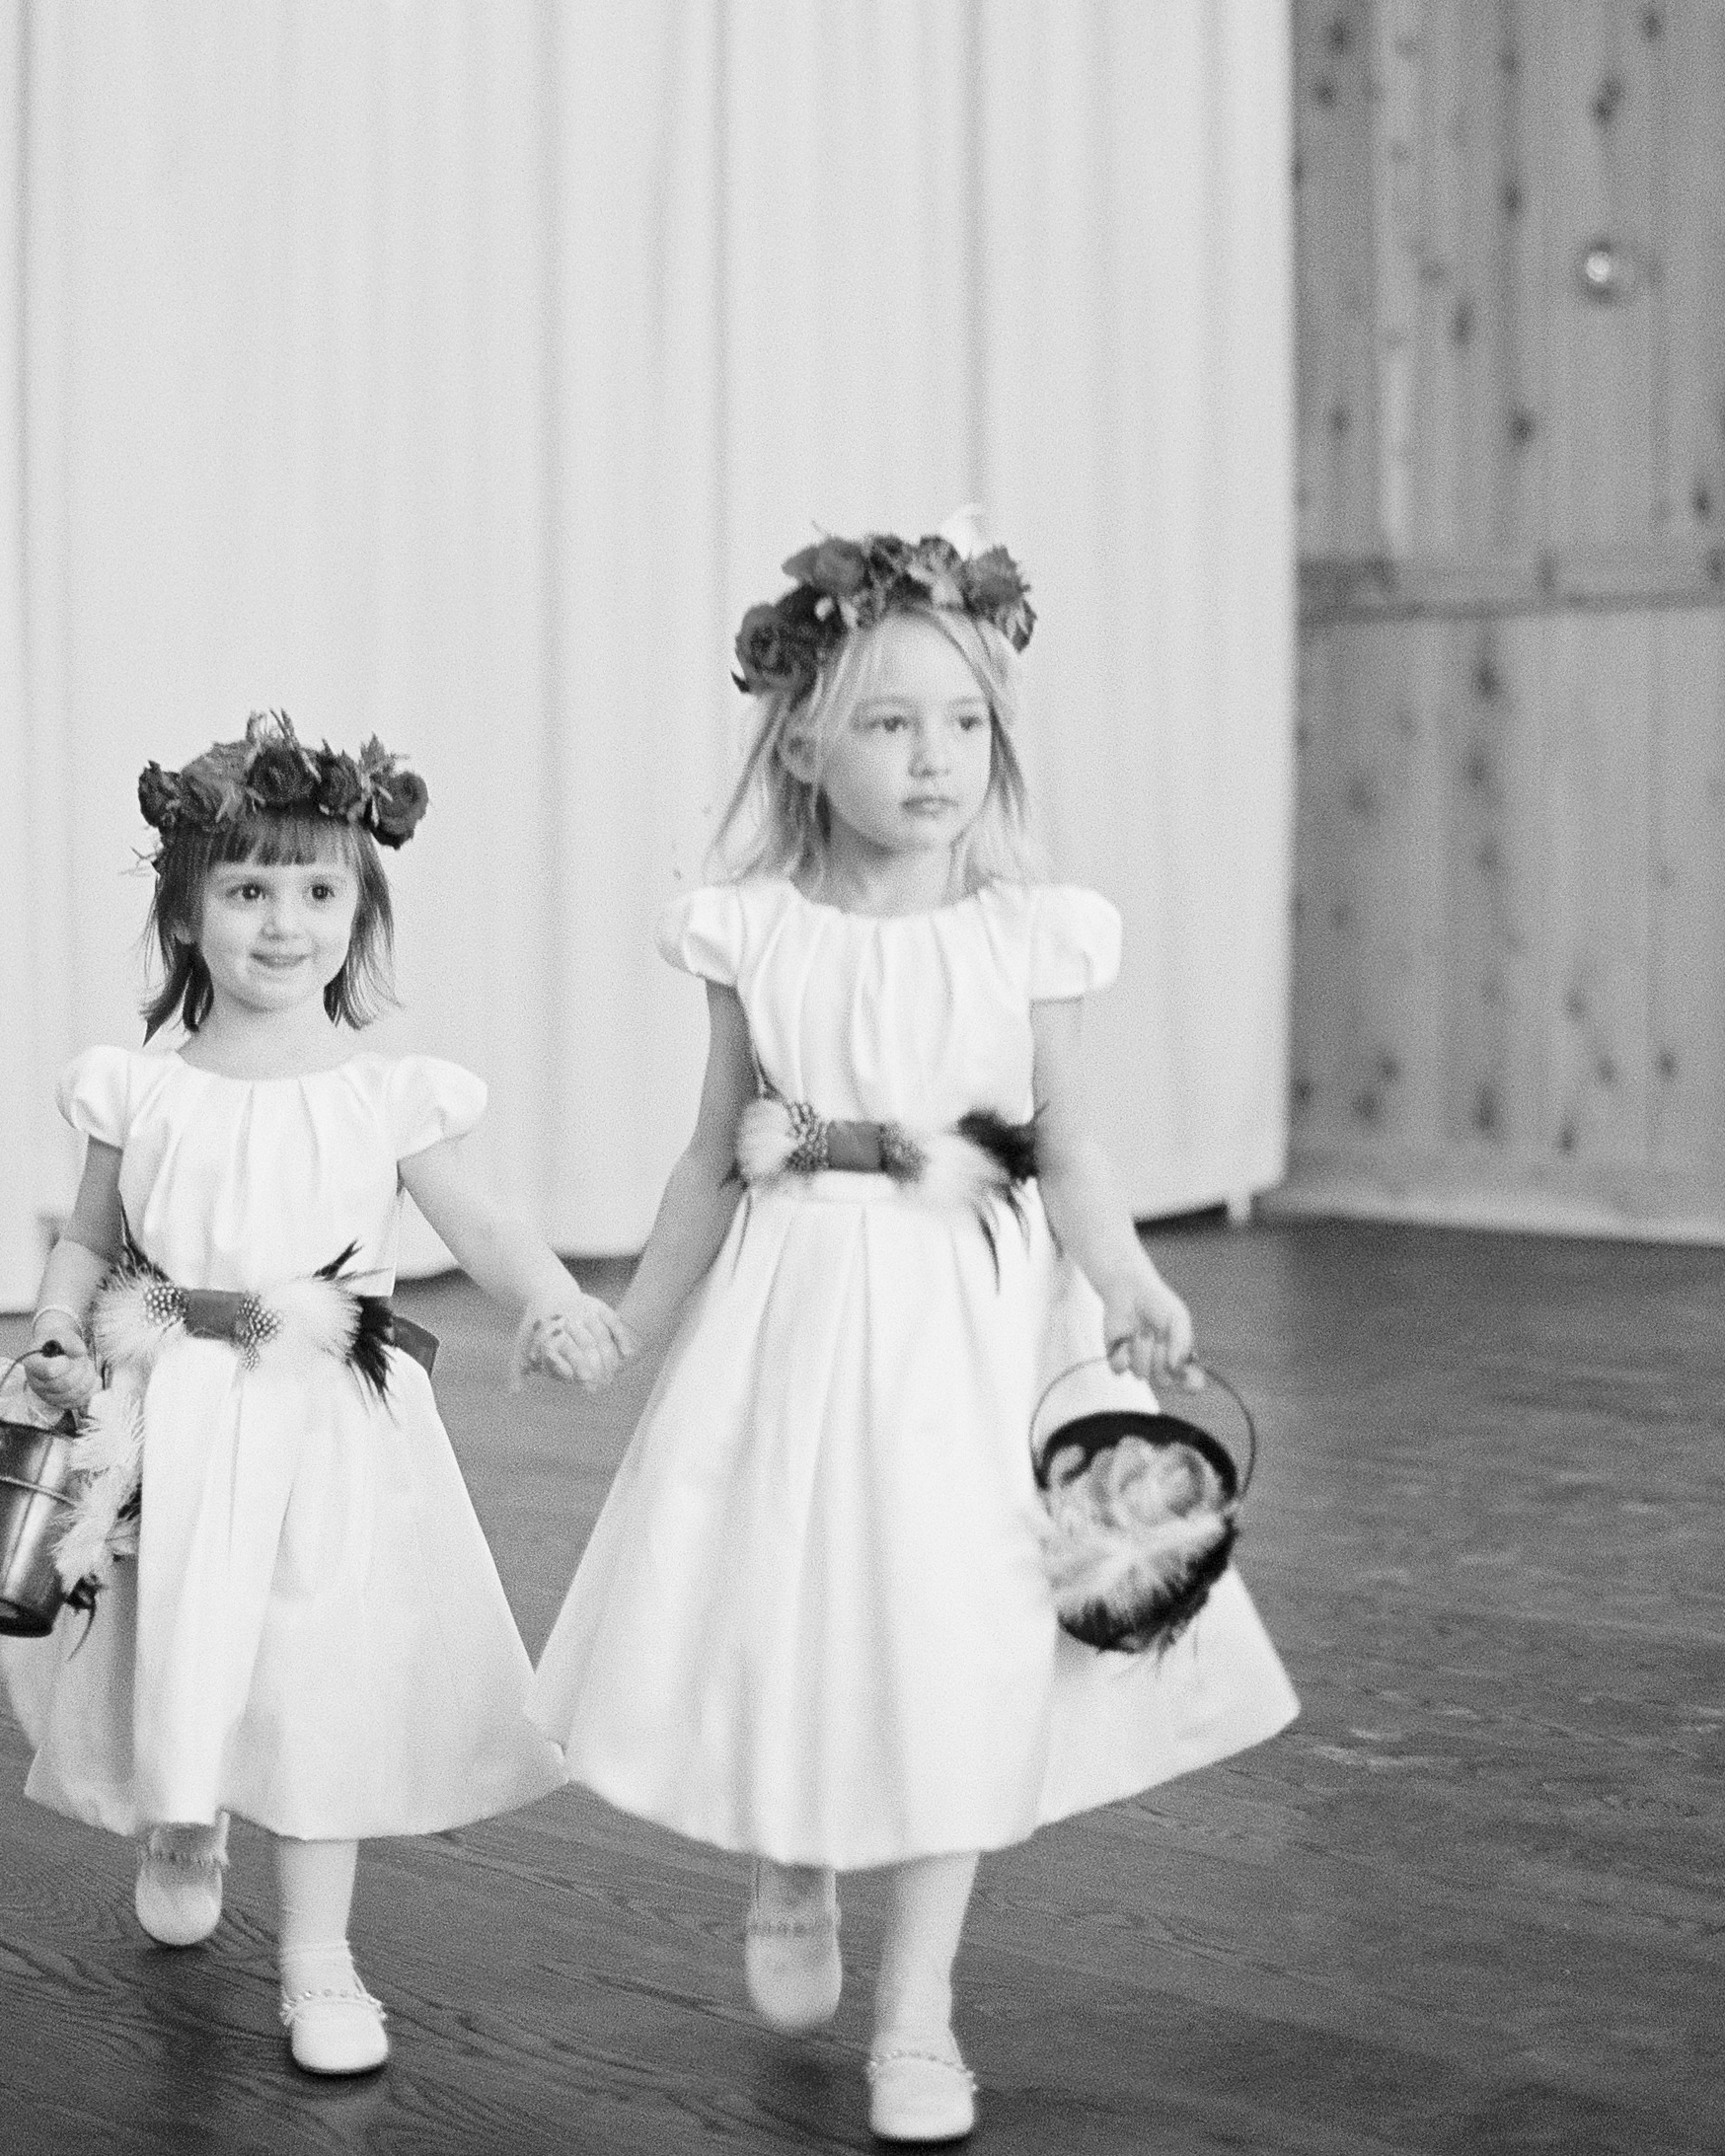 tiffany-nicholas-wedding-girls-105-s111339-0714.jpg